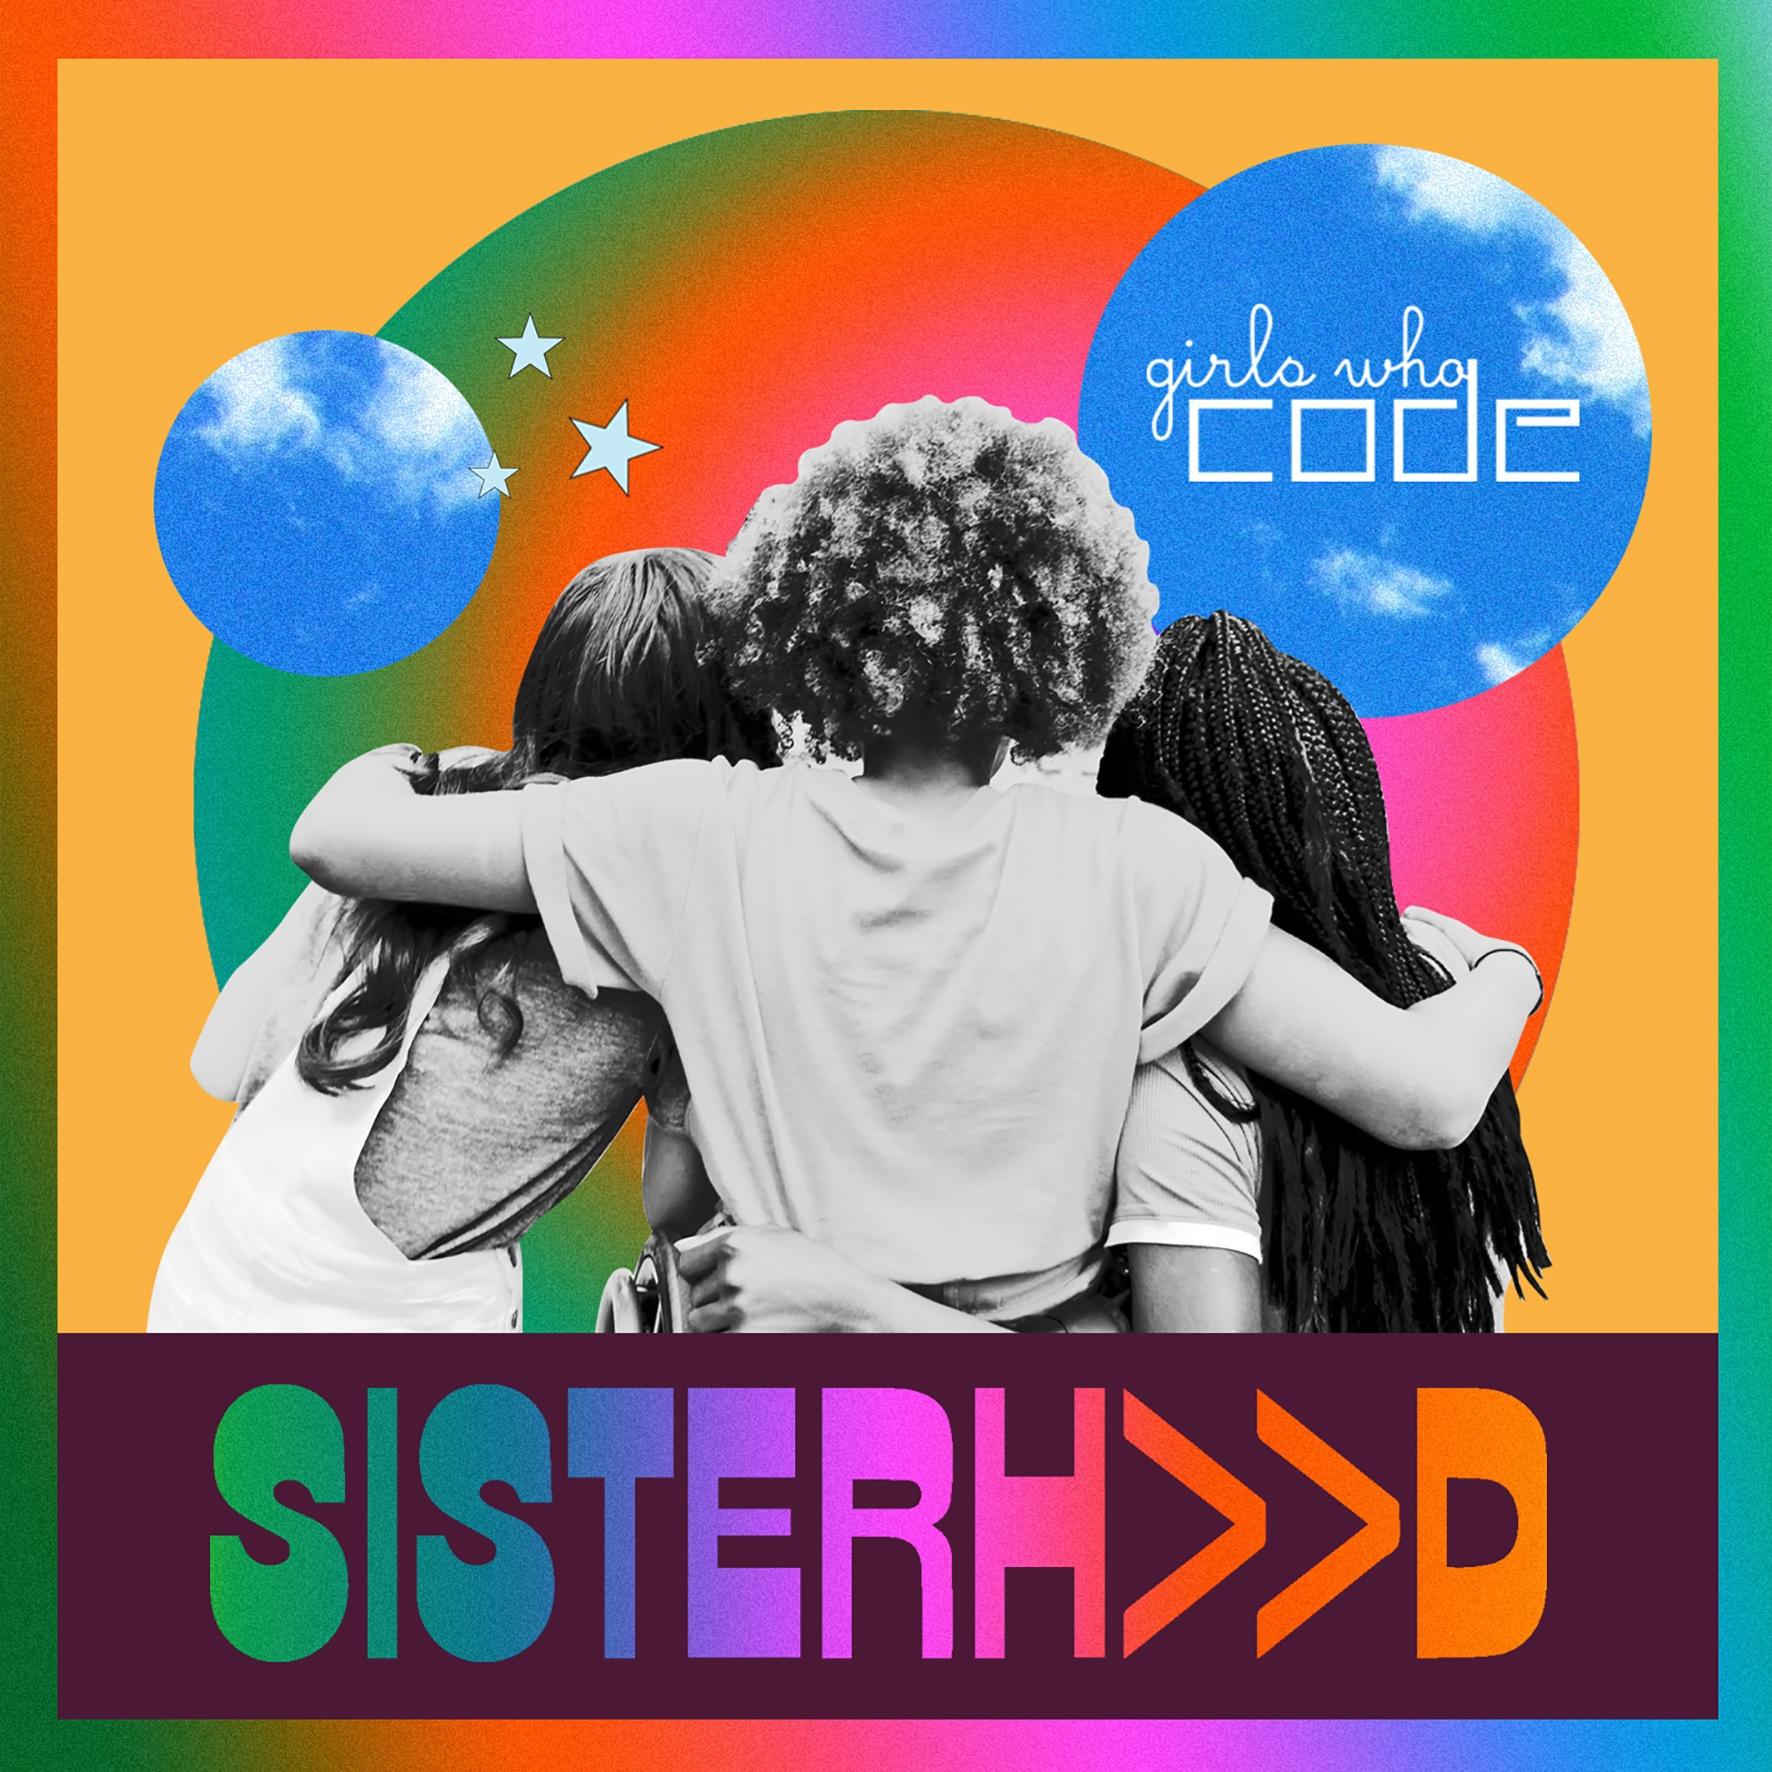 Girls Who Code Releases Digital Visual Album Celebrating Sisterhood, Empowering Girls - girlswhocode